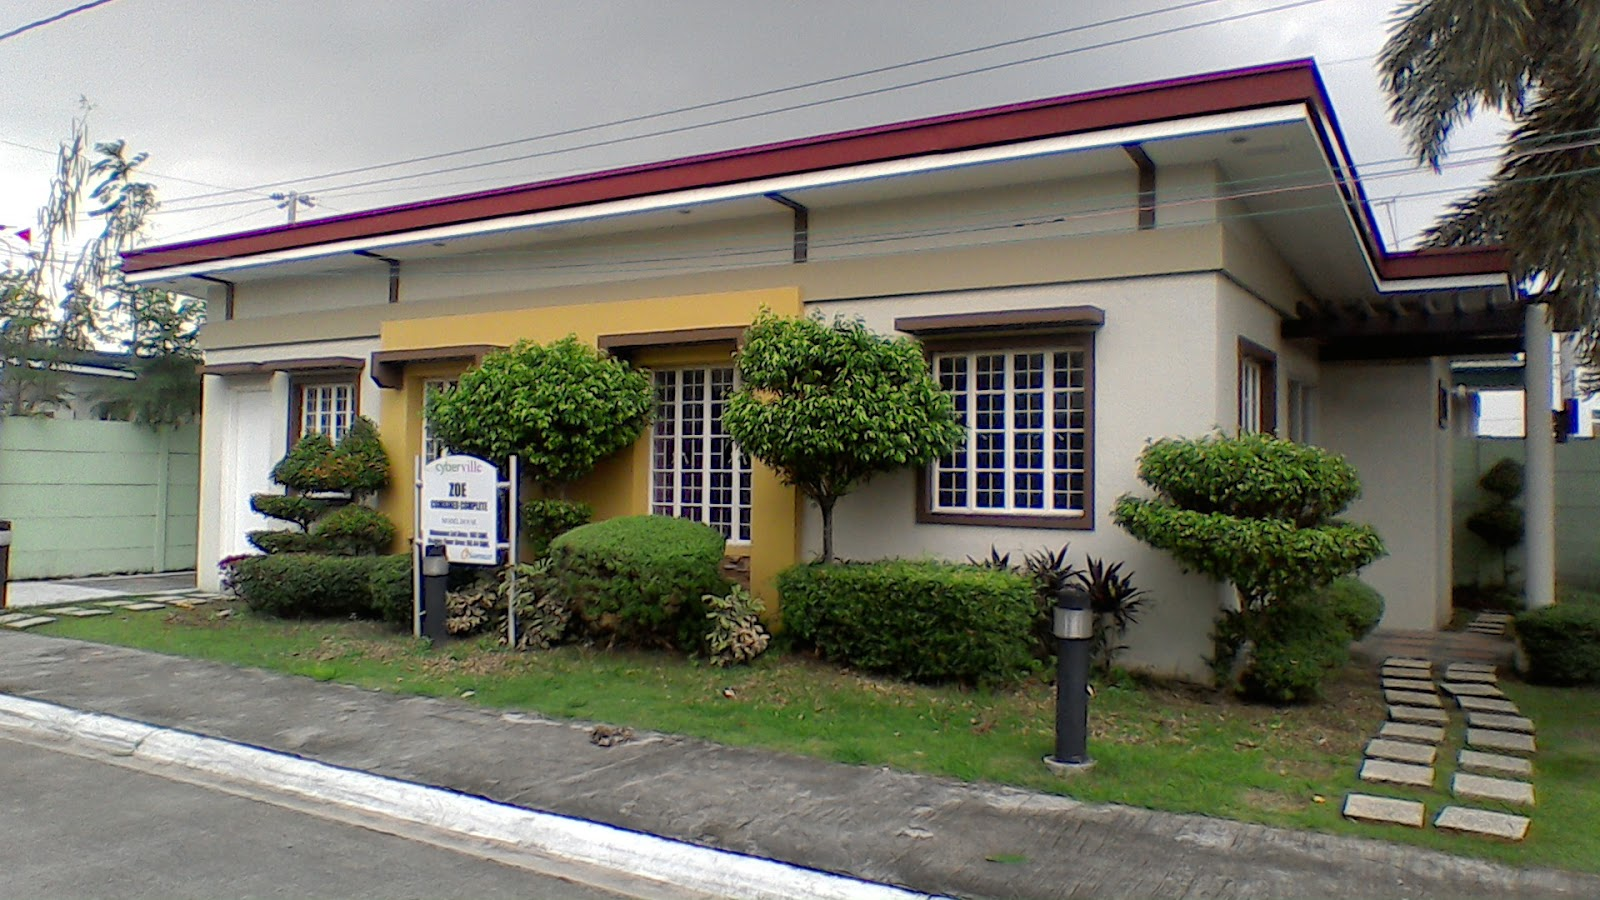 ZOE 3 Bedrooms 2 Toilet & Bath House and Lot in Dasmarinas Cavite